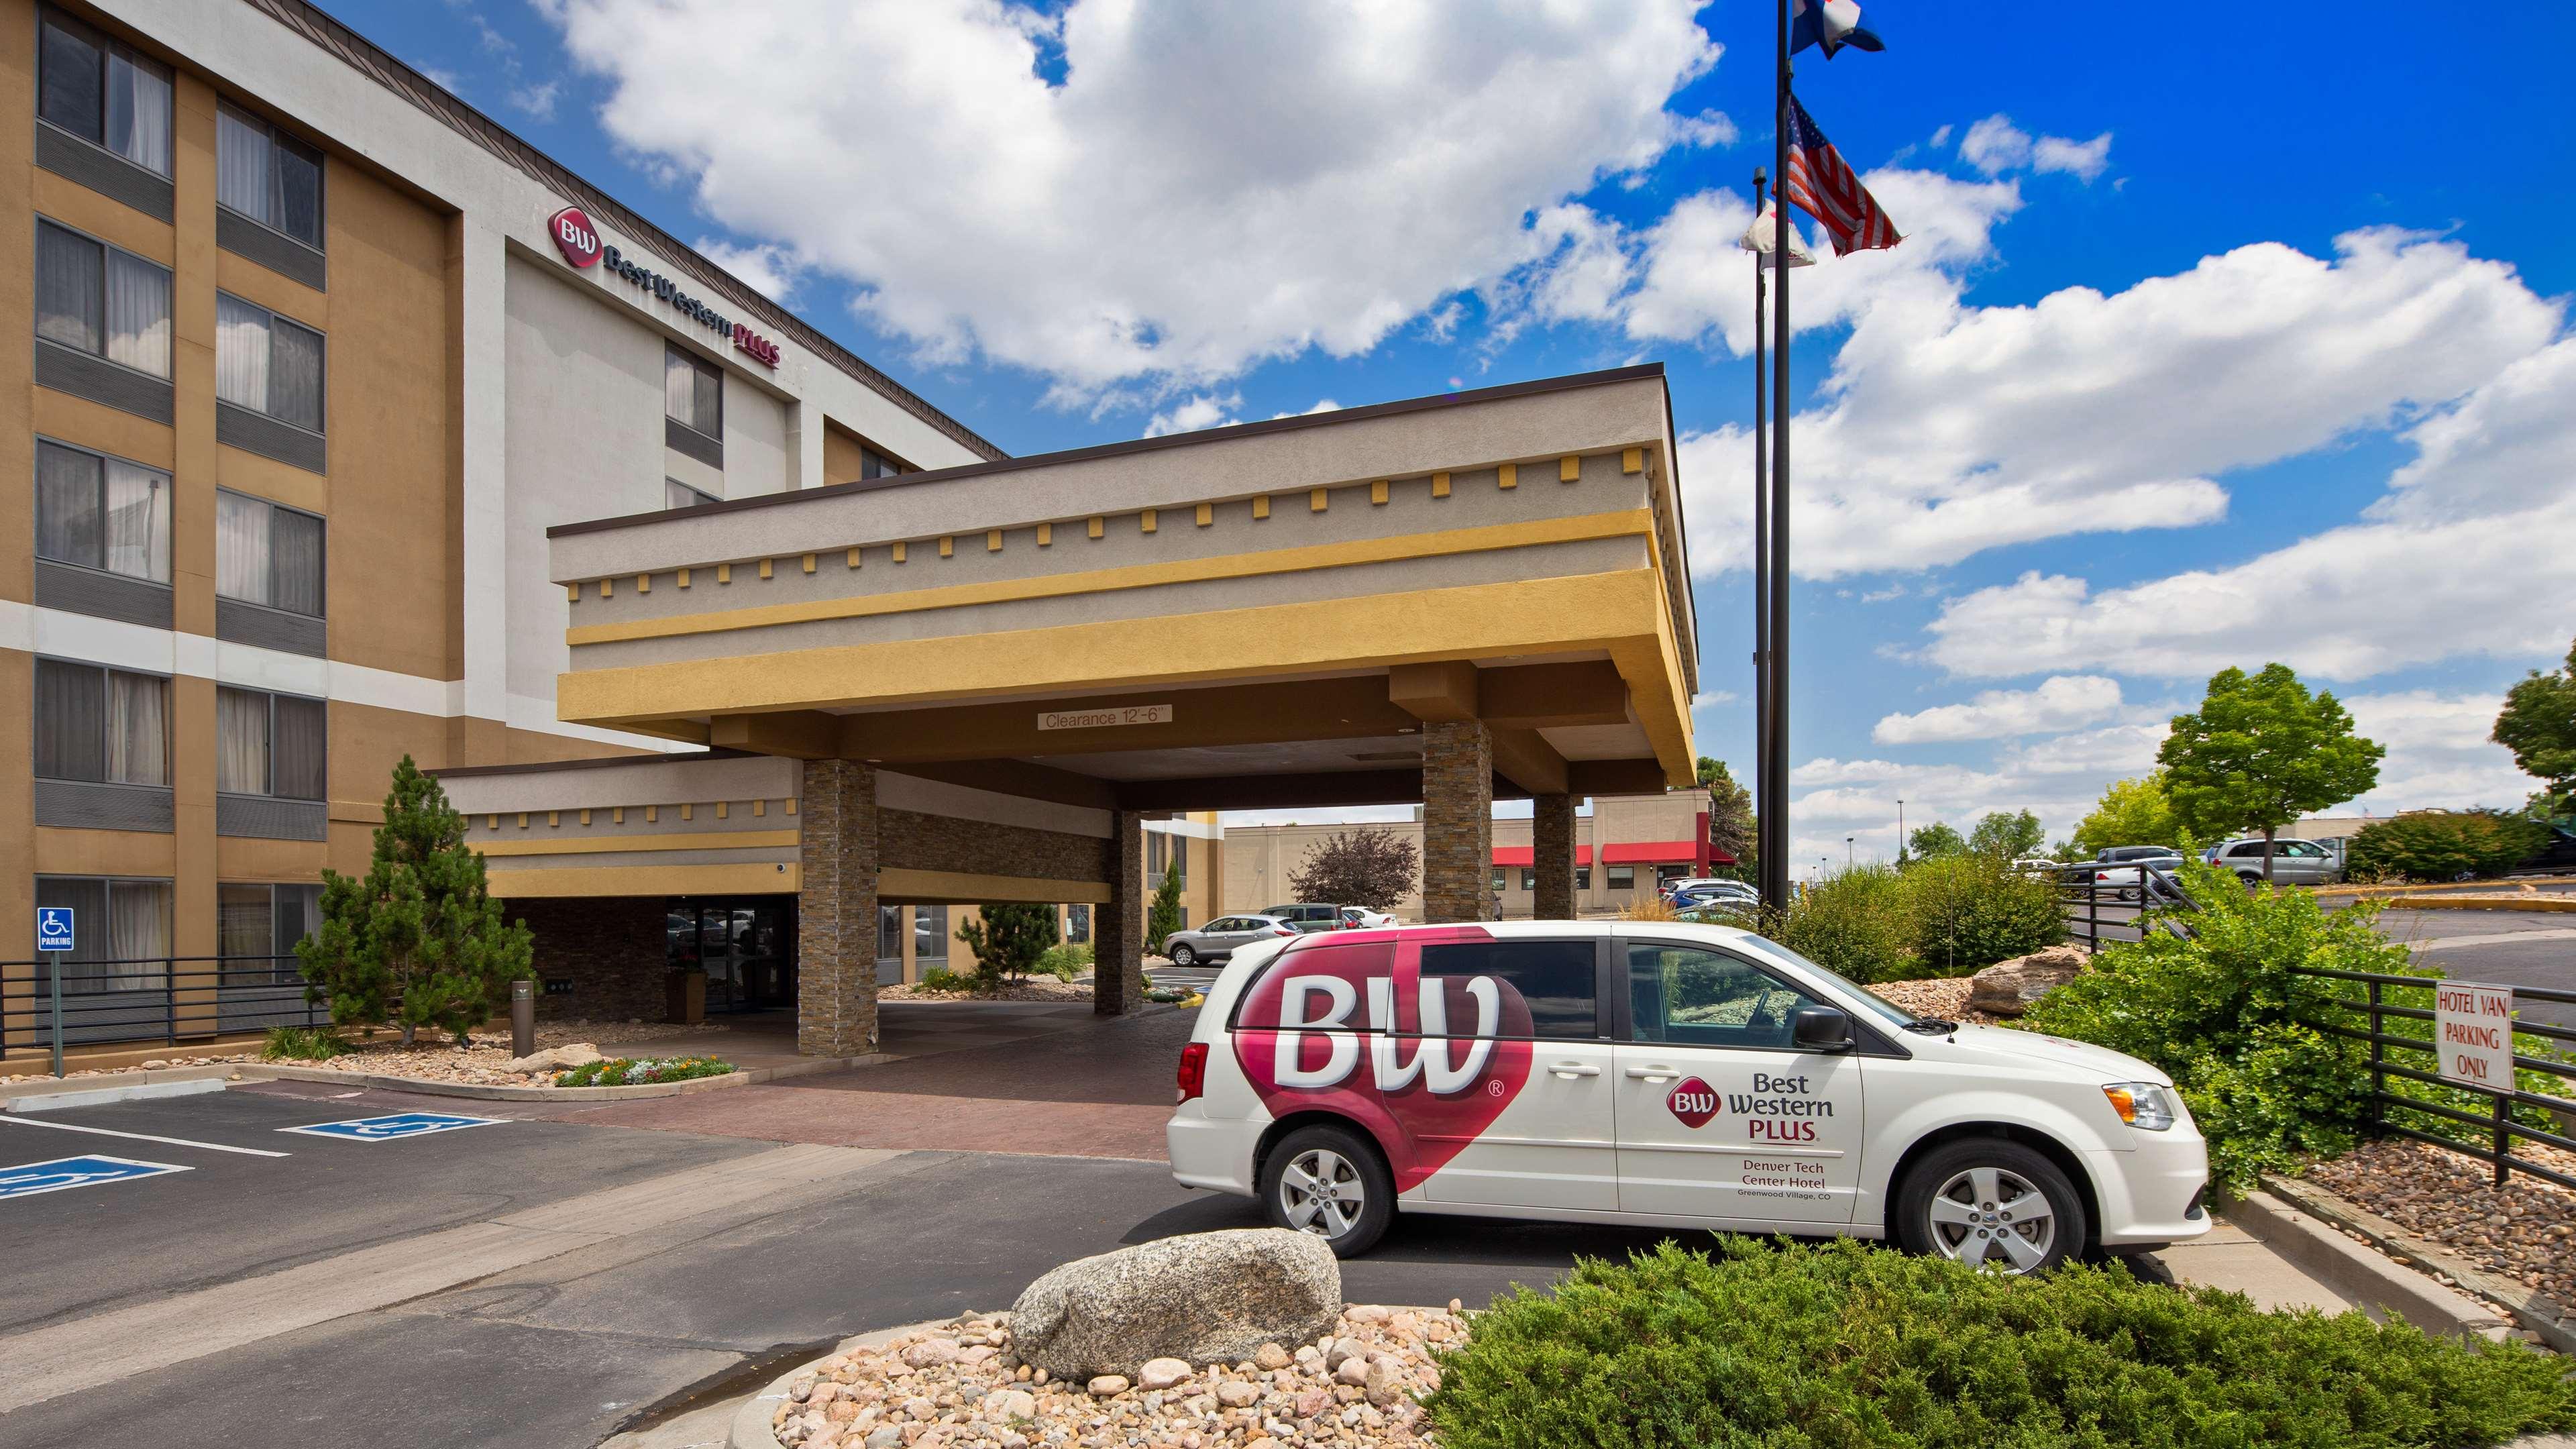 Best Western Plus Denver Tech Center Hotel image 0